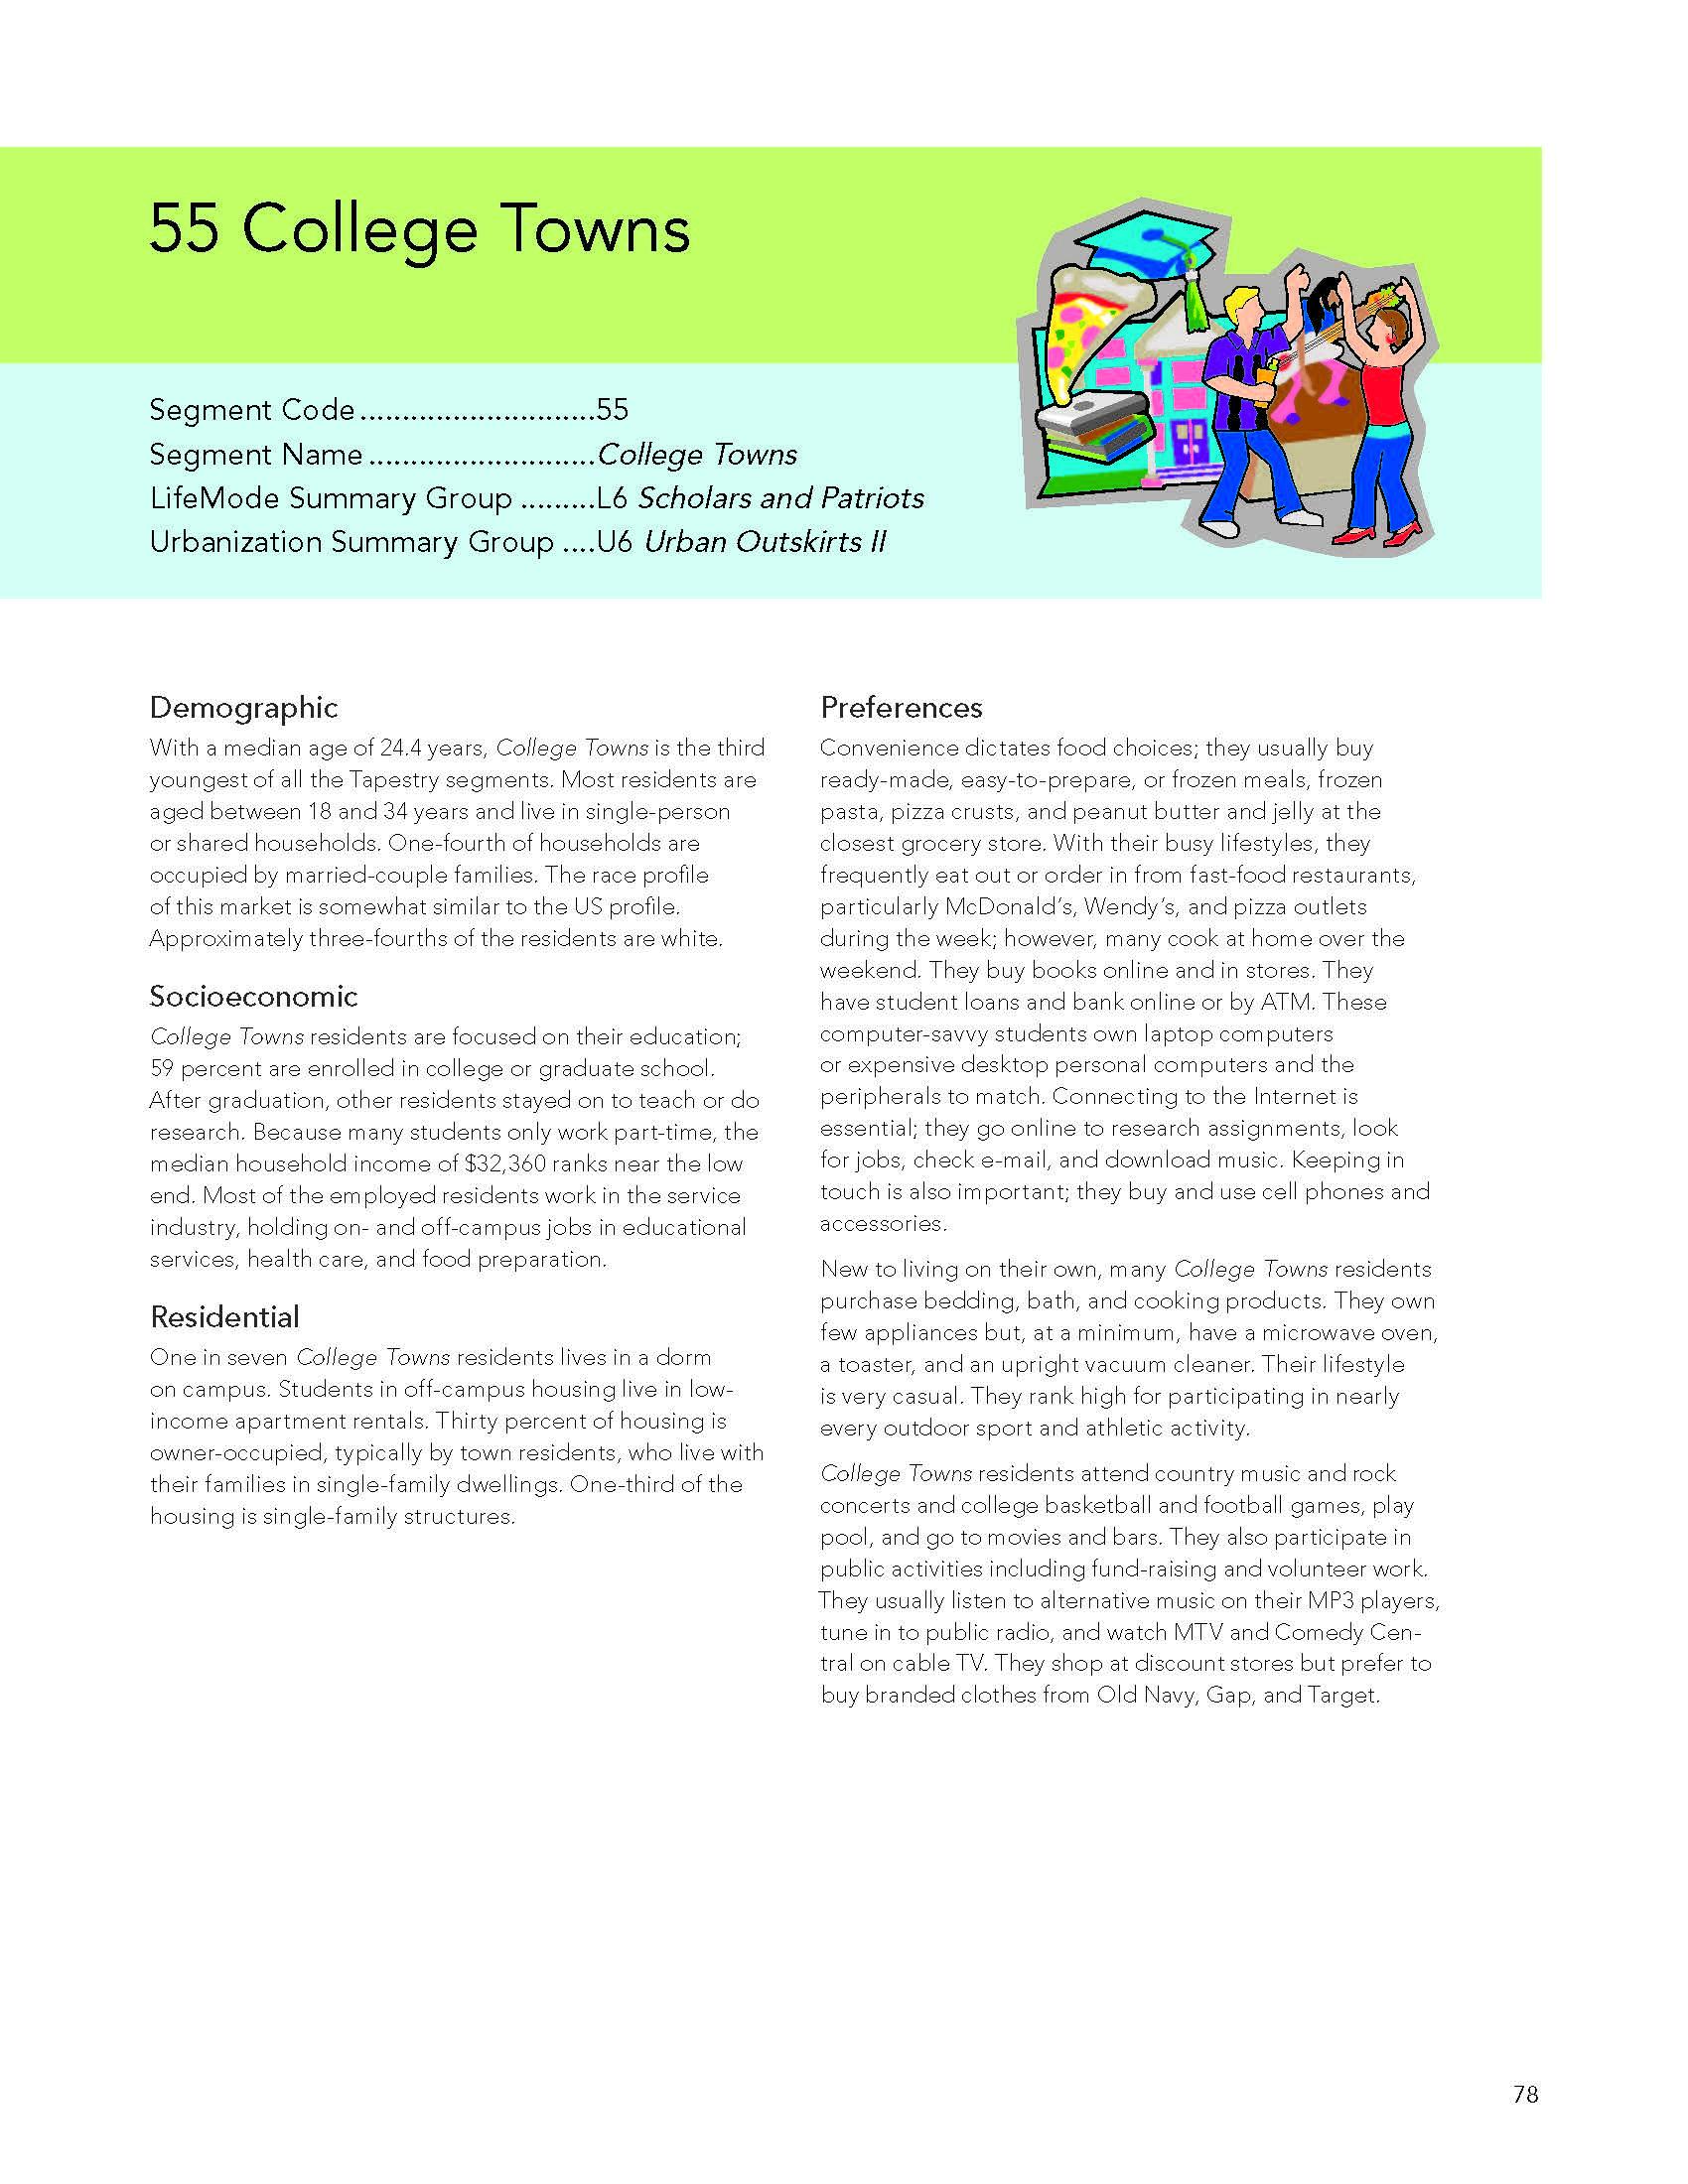 tapestry-segmentation_Page_81.jpg